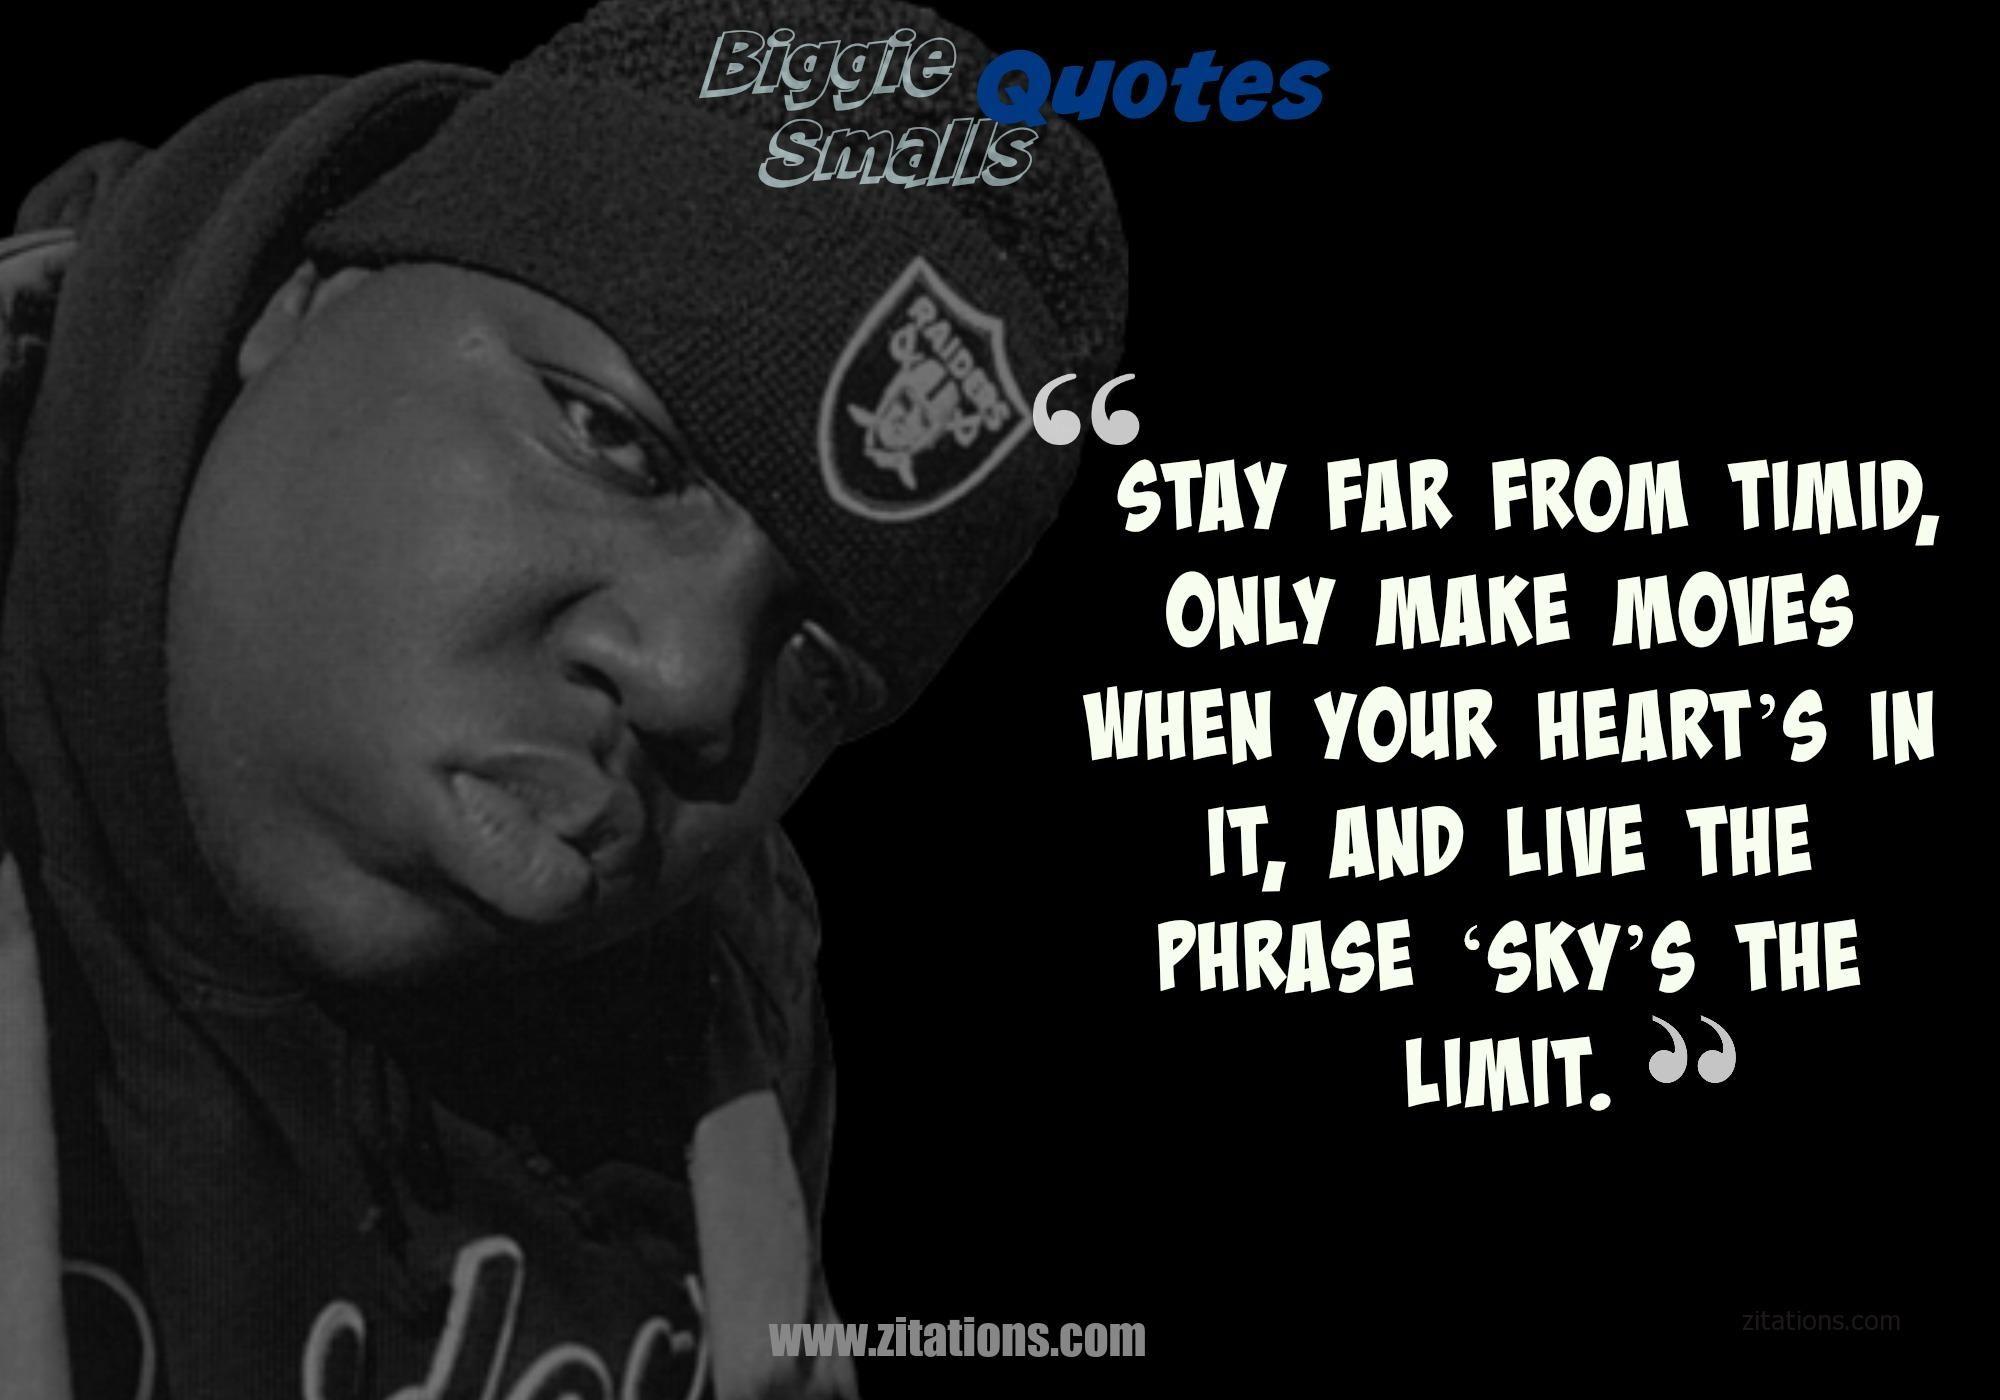 Biggie Smalls Quotes Biggie Smalls Quotes Notorious Big Quotes Life Quotes